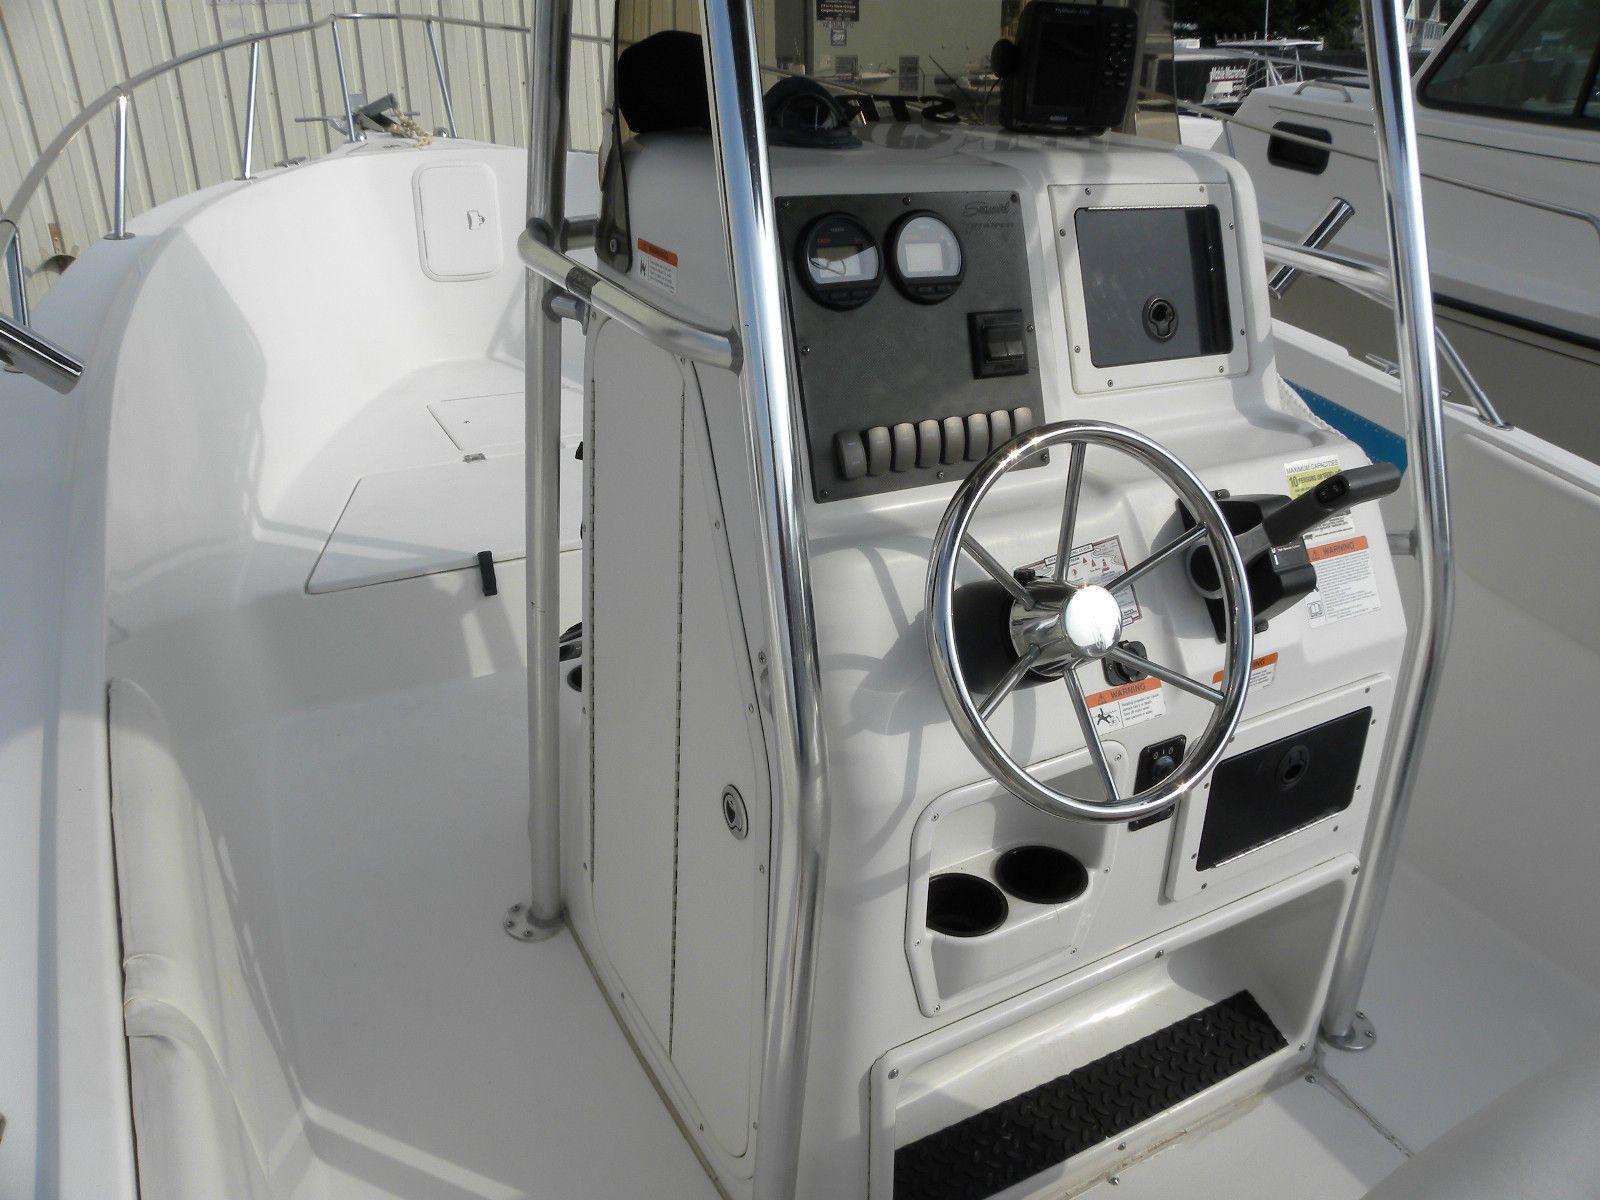 2004 Seaswirl Striper 2301 Center Console With 2005 F225 Yamaha 4 Stroke